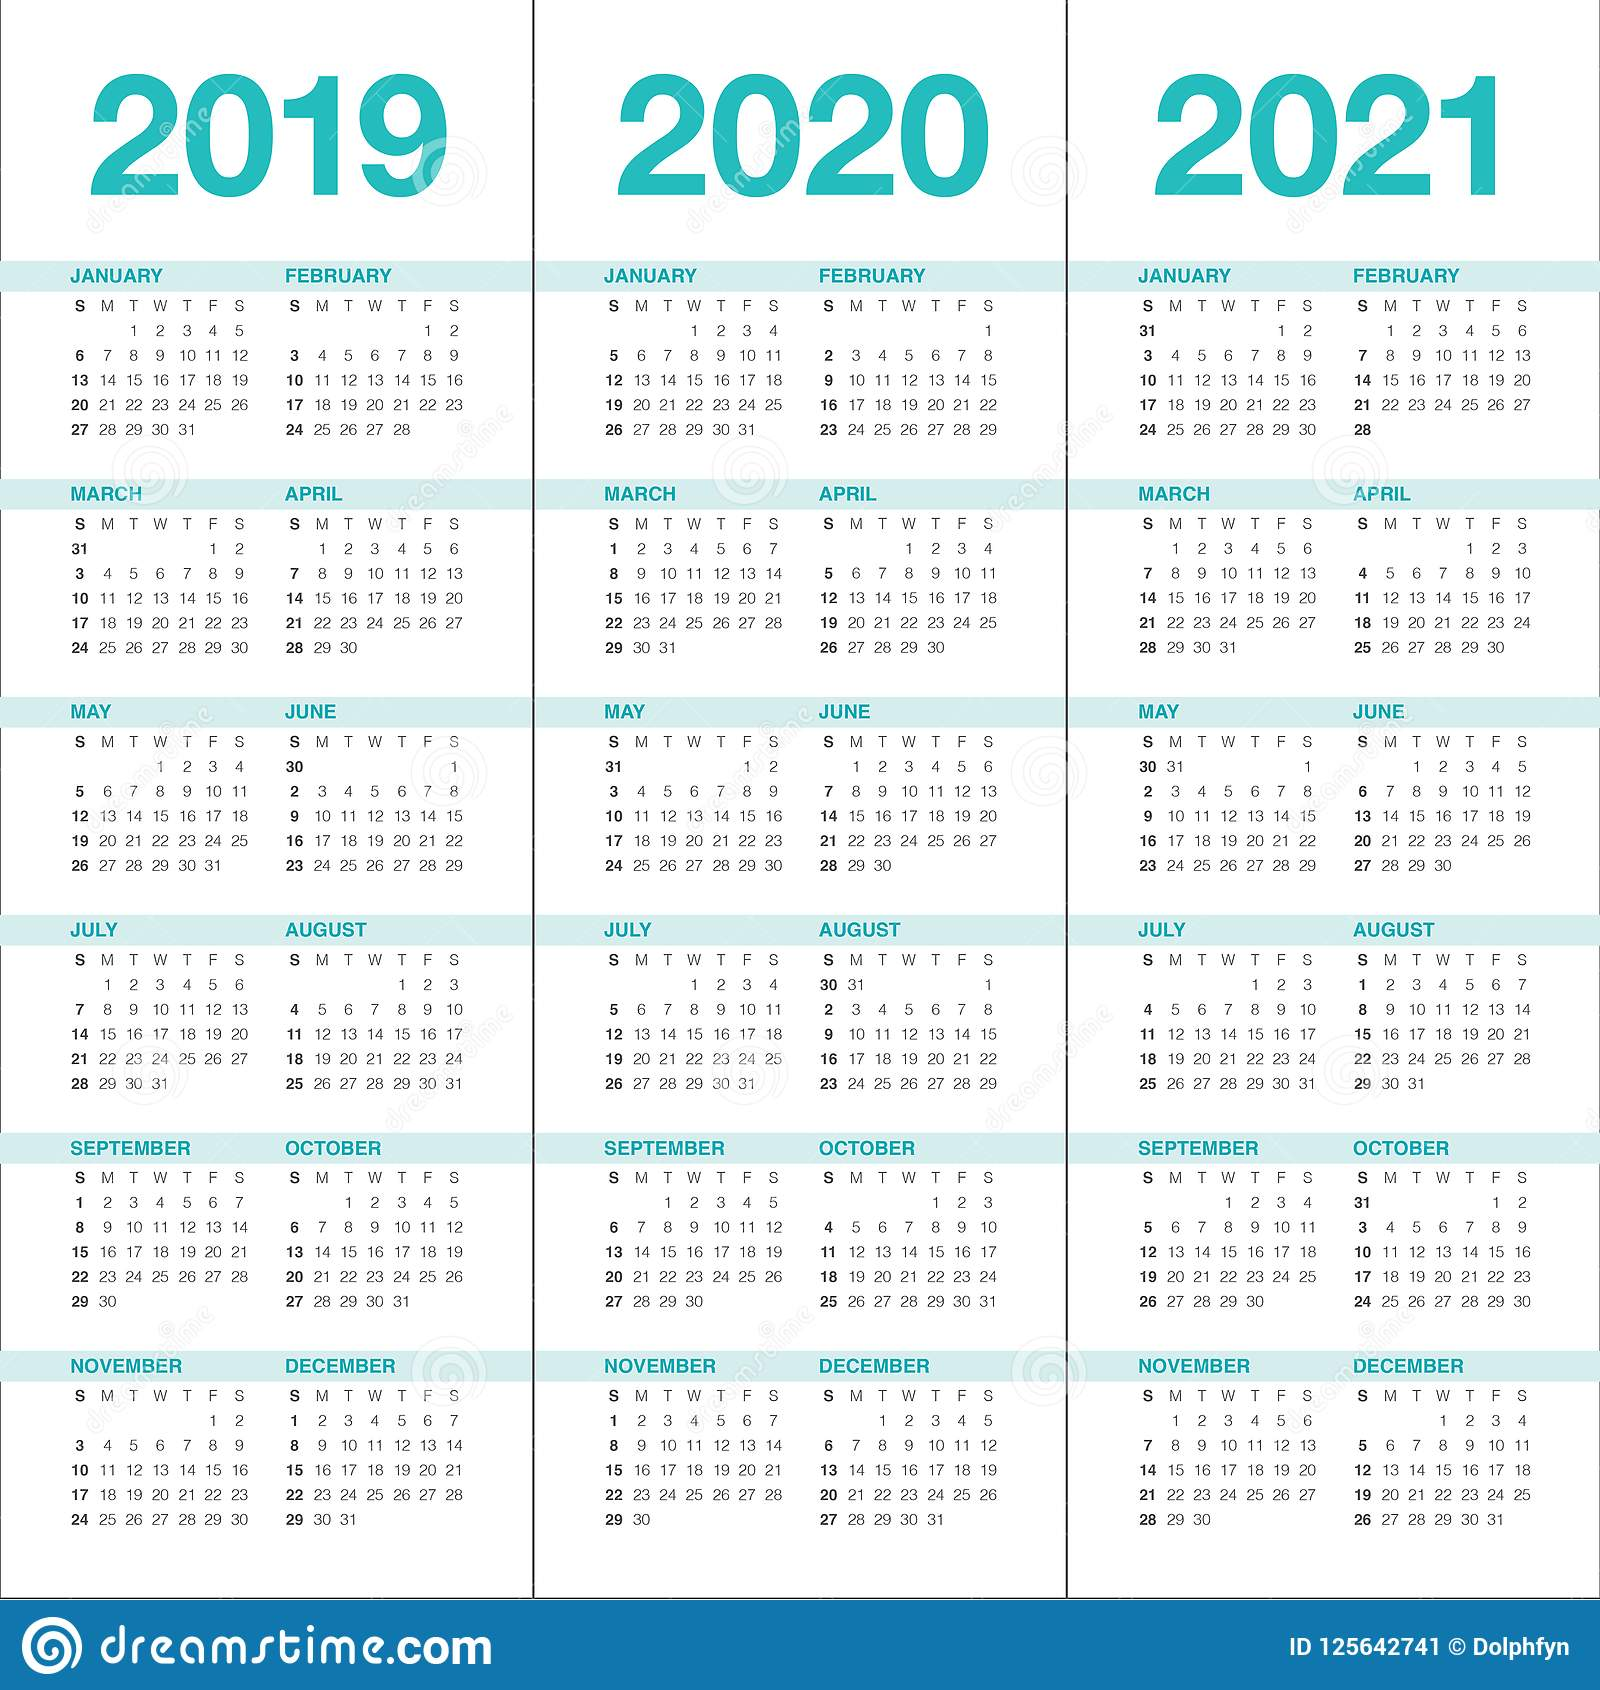 Calendrier Mensuel 2020 2019.Annee 2019 2020 Calibre De Conception De Vecteur De 2021